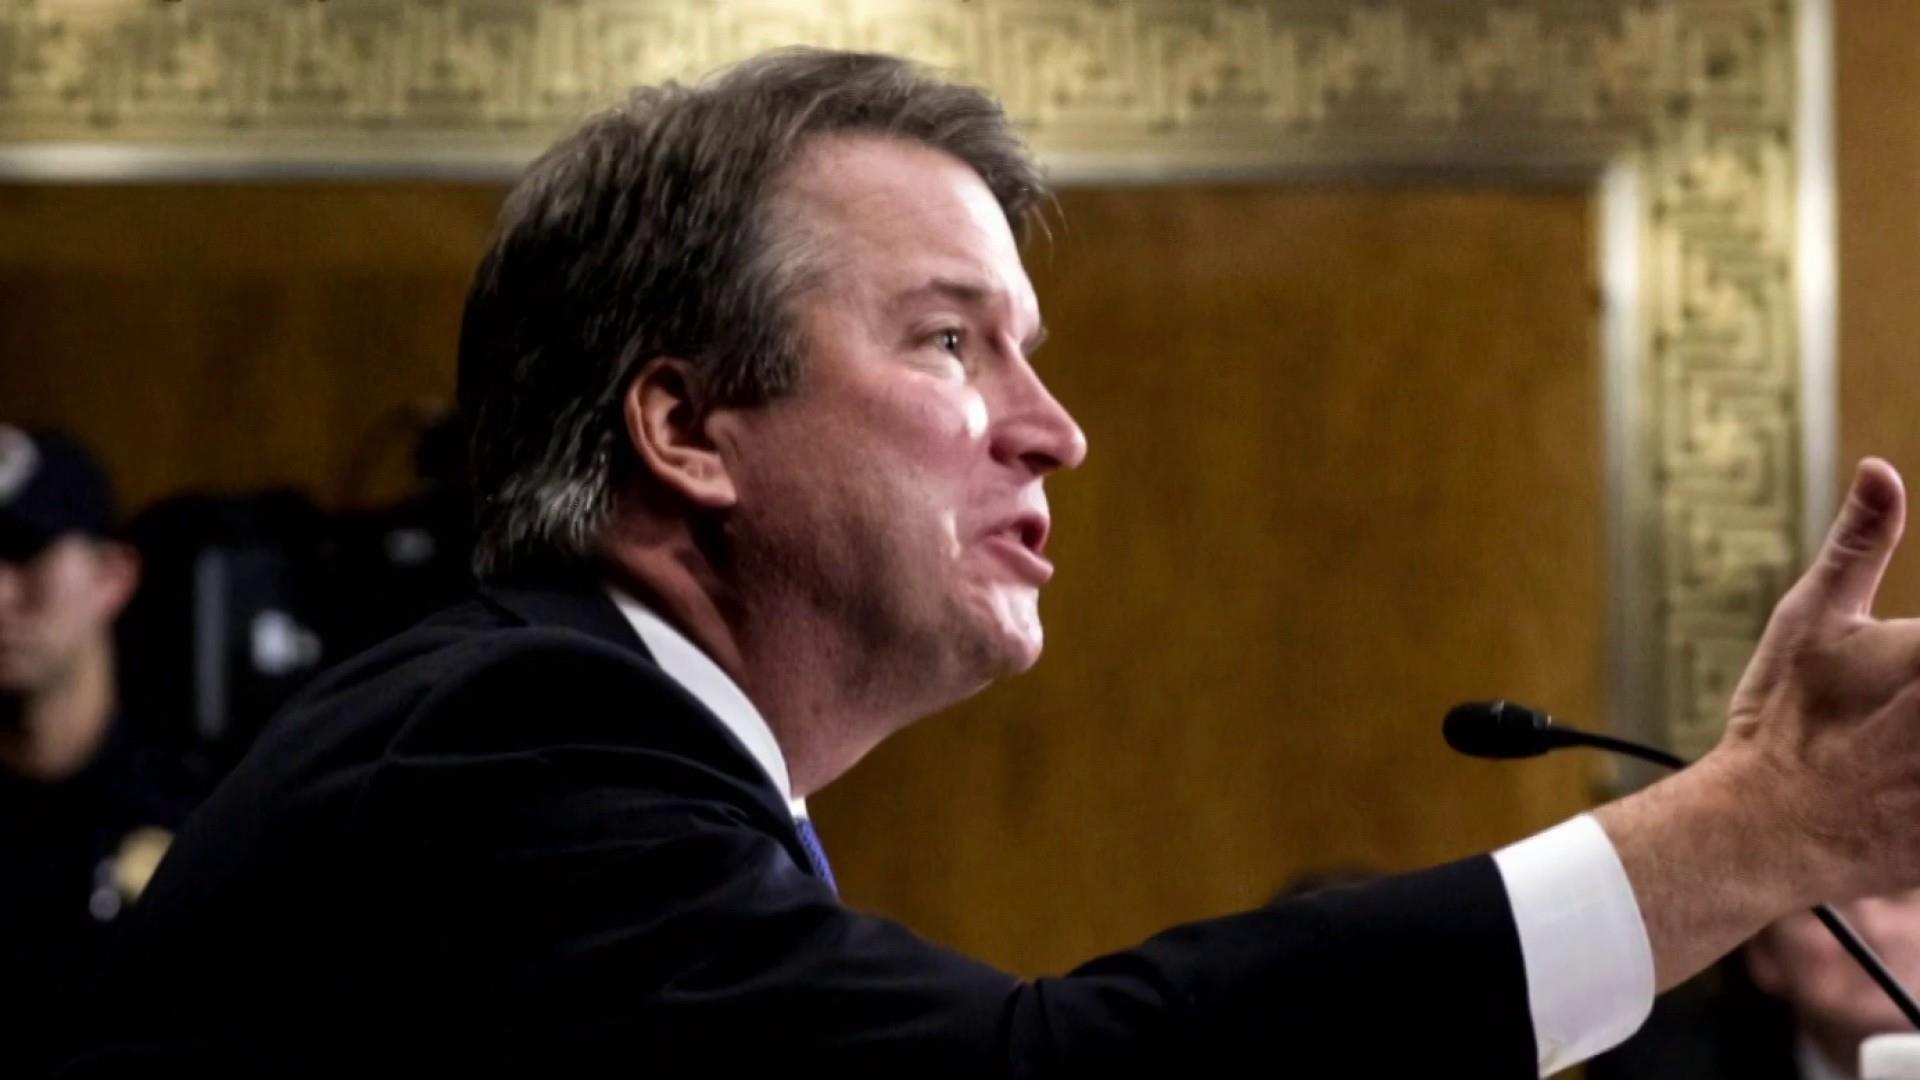 'I wouldn't confirm' Brett Kavanaugh, says law scholar